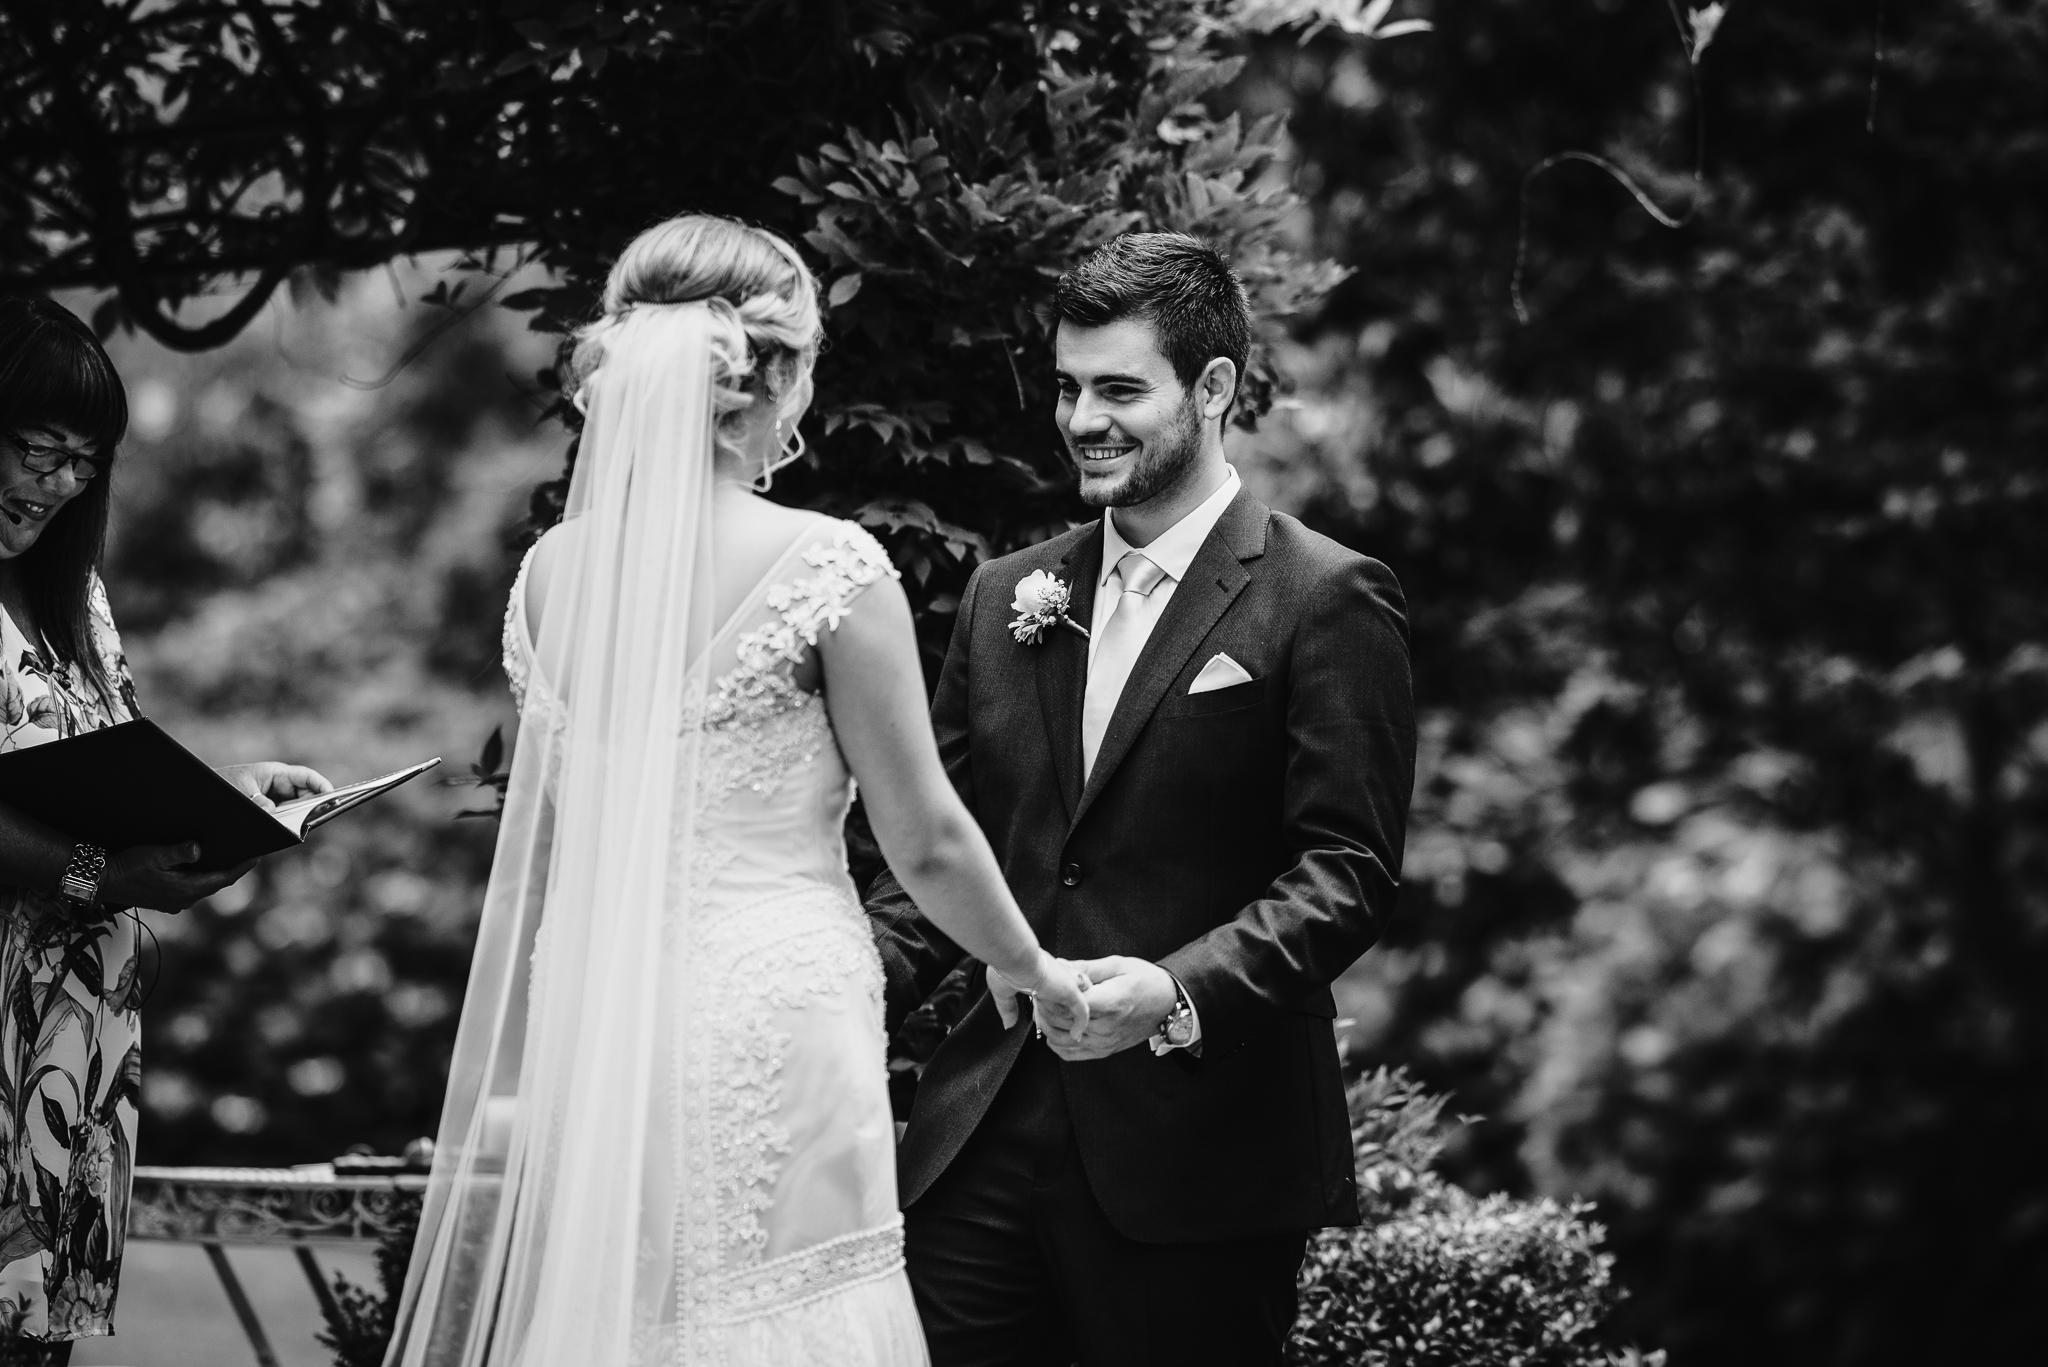 Tauranga-Coromandel-Elegant-Wedding-Photographer-Charlemagne-Lodge-64.jpg